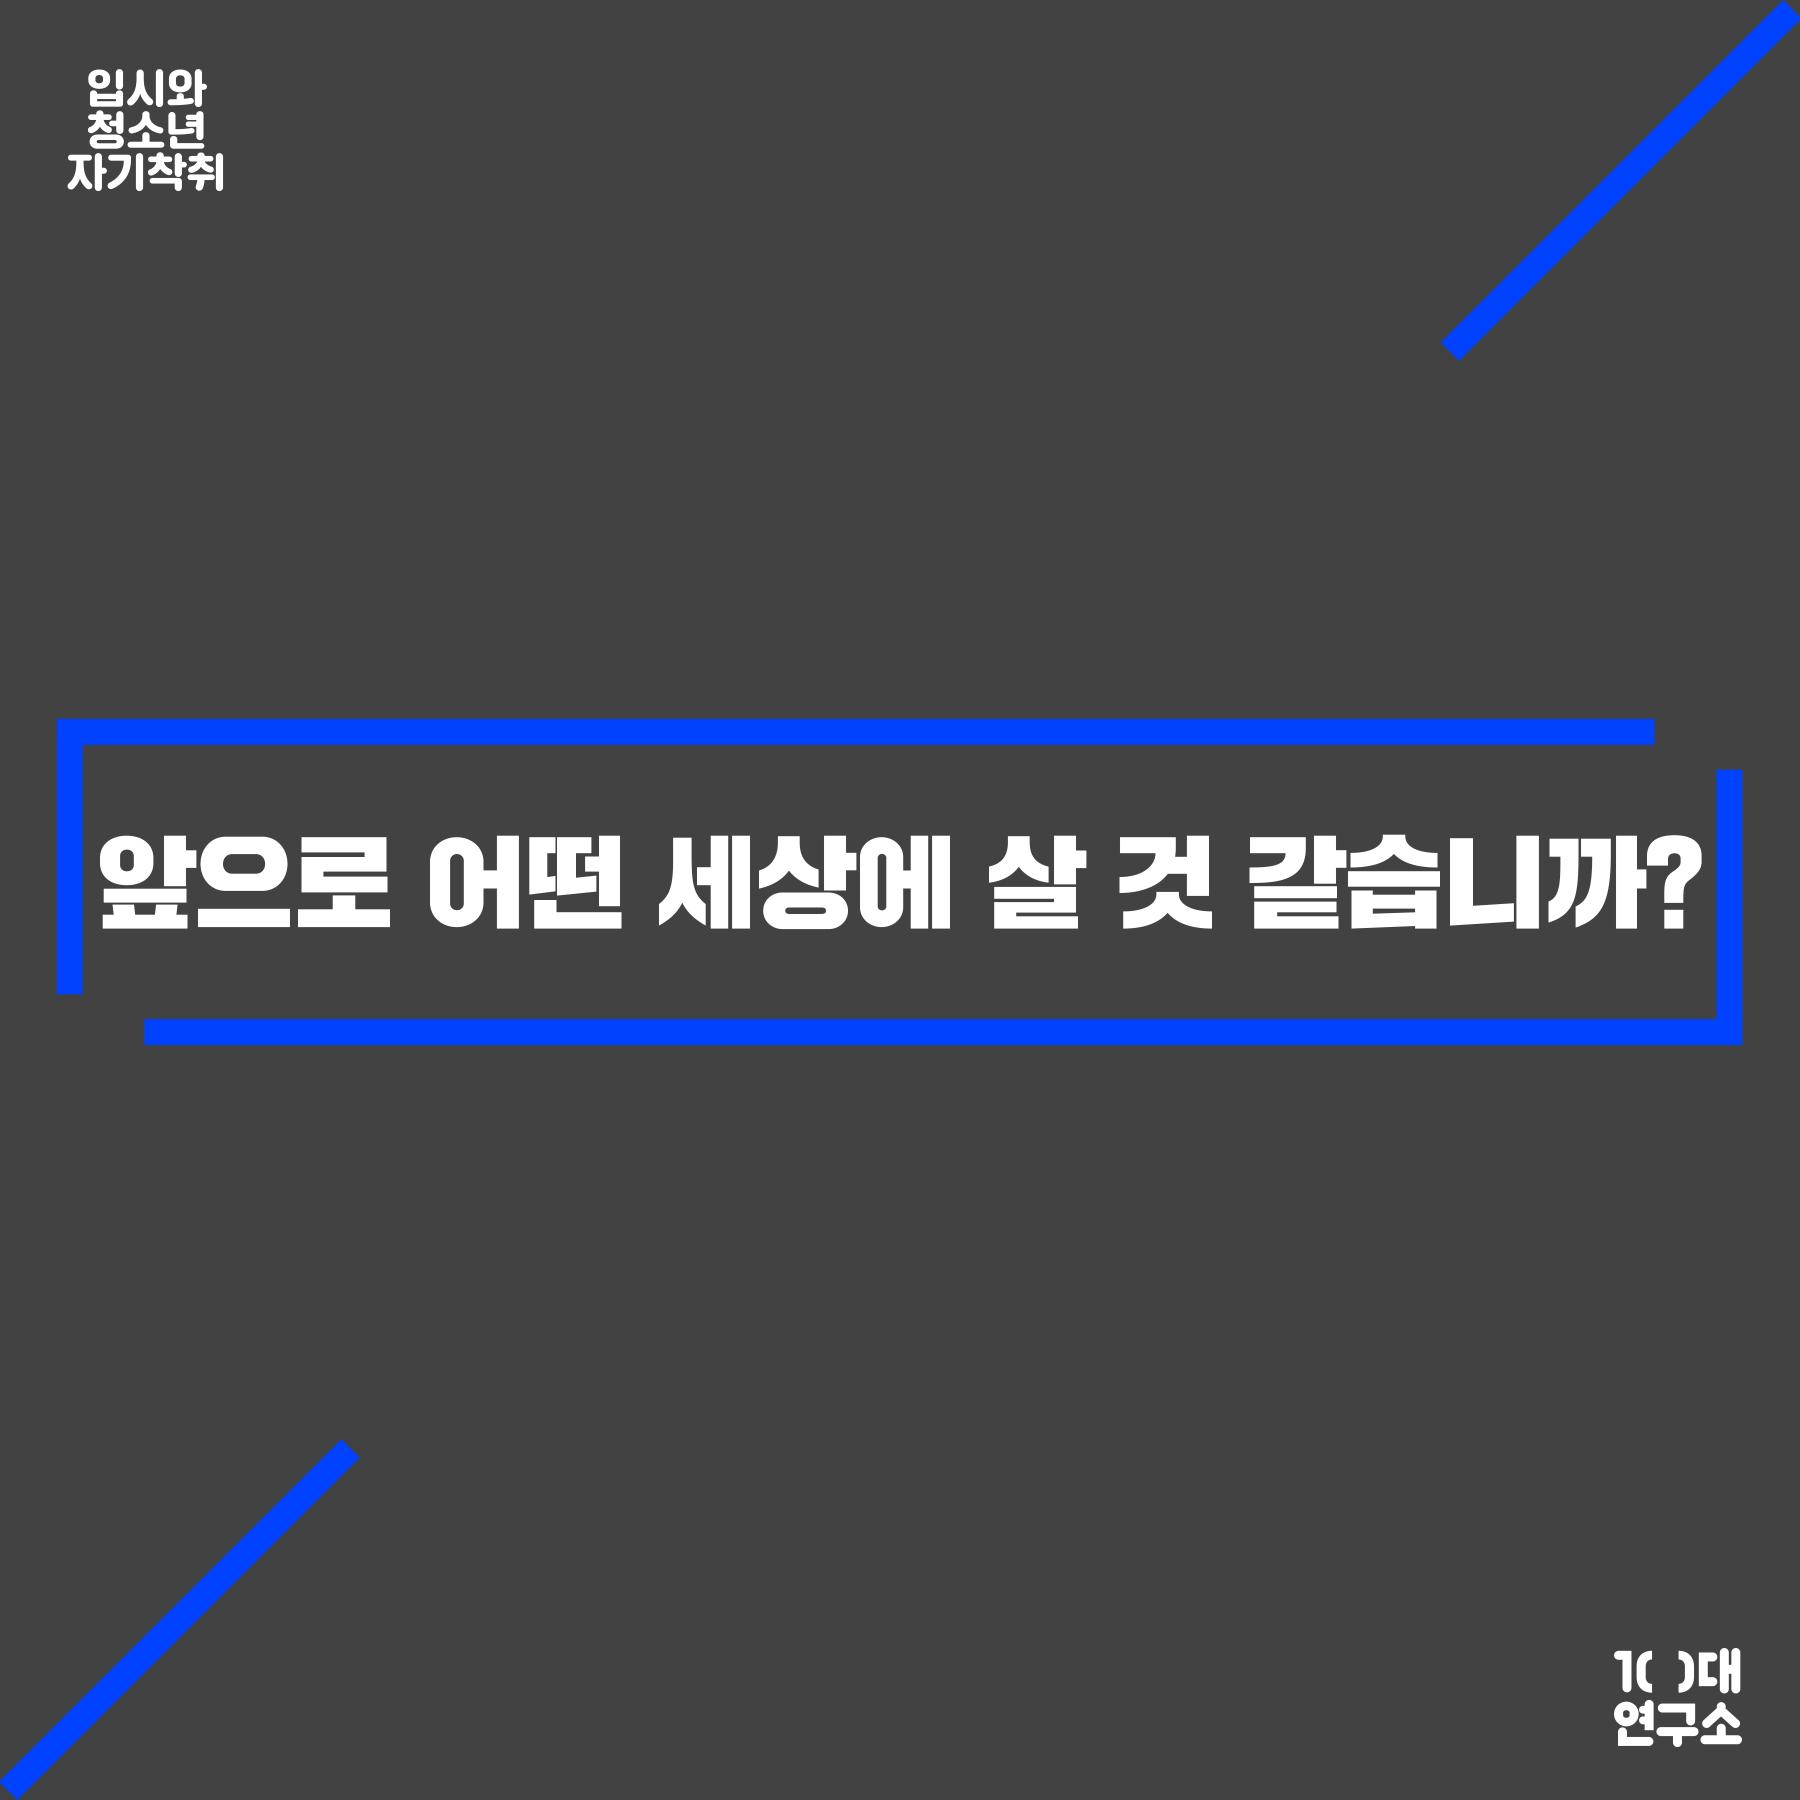 A_입시와 청소년 자기착취_17.png